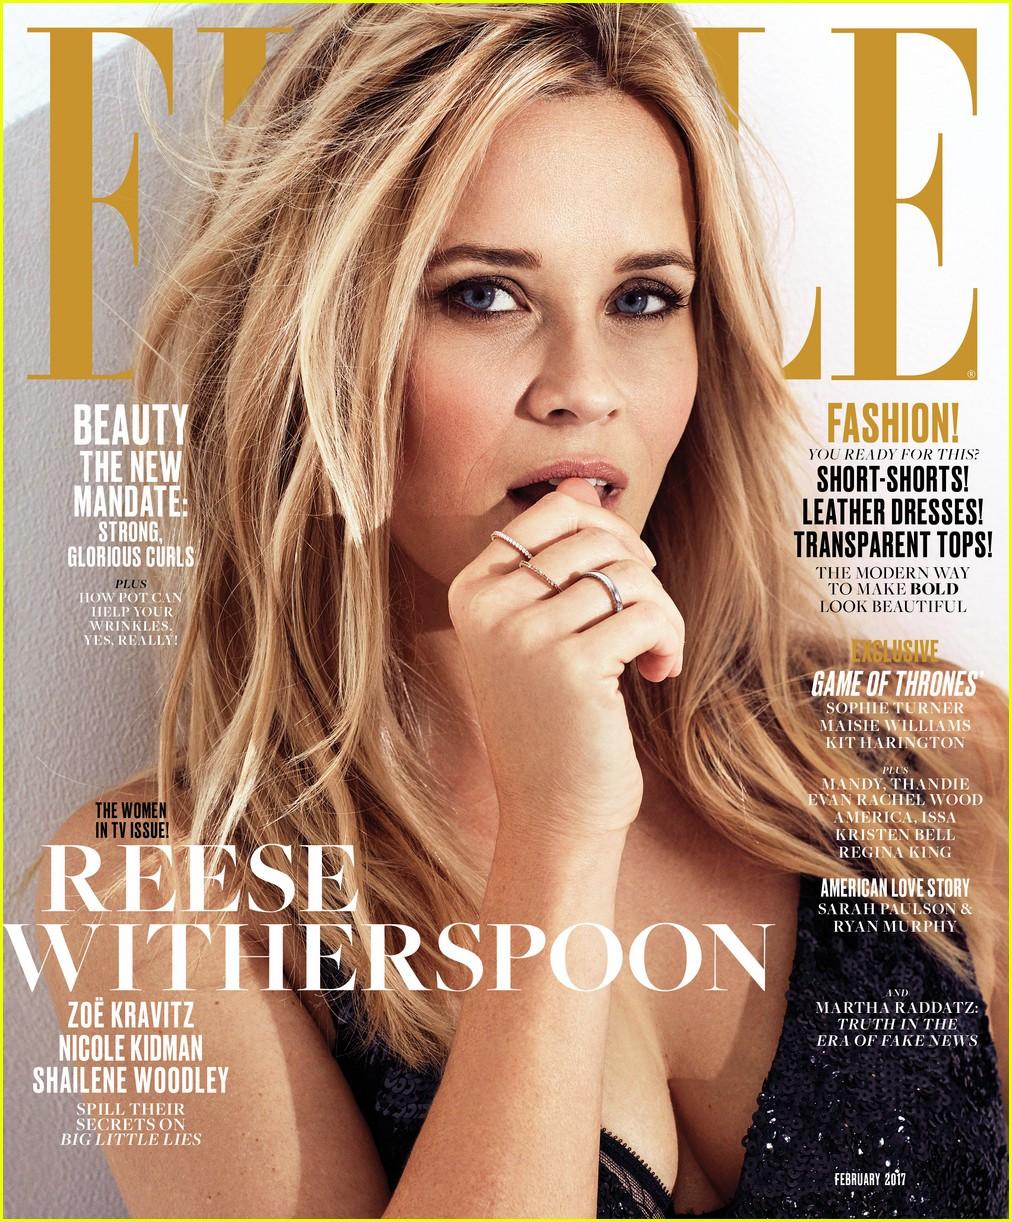 little big lies elle magazine 023841120